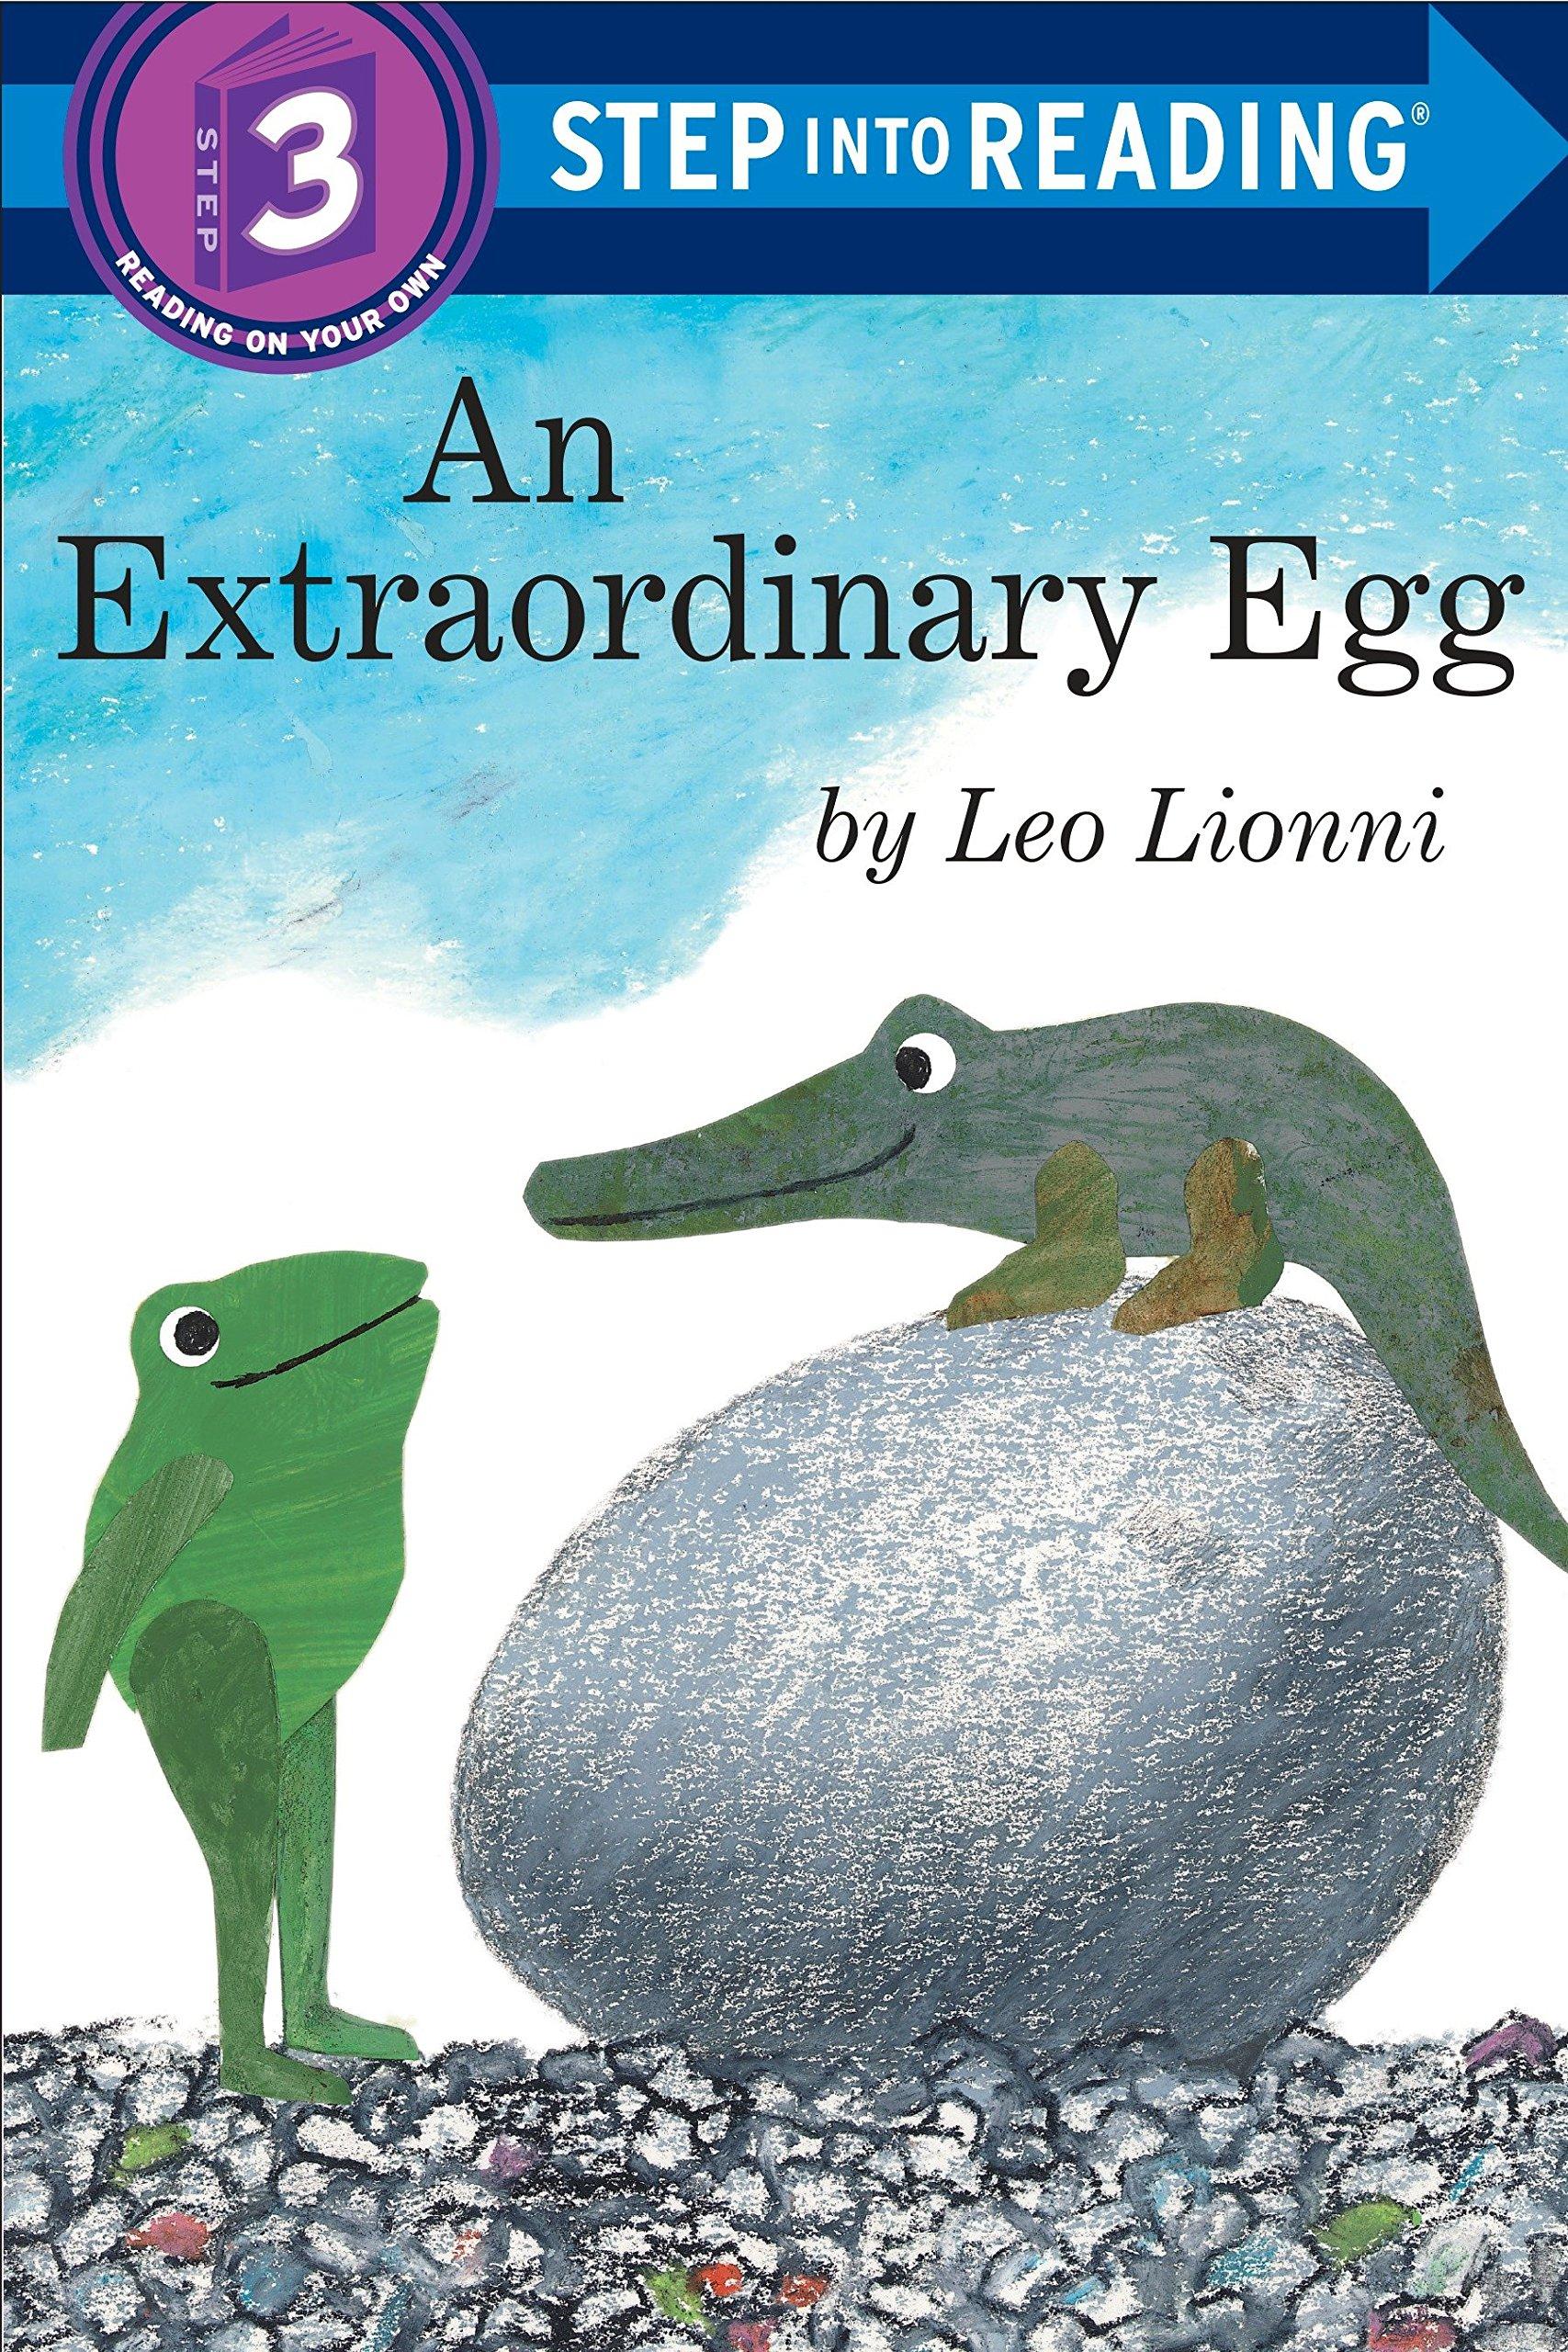 An Extraordinary Egg (Step into Reading) ebook